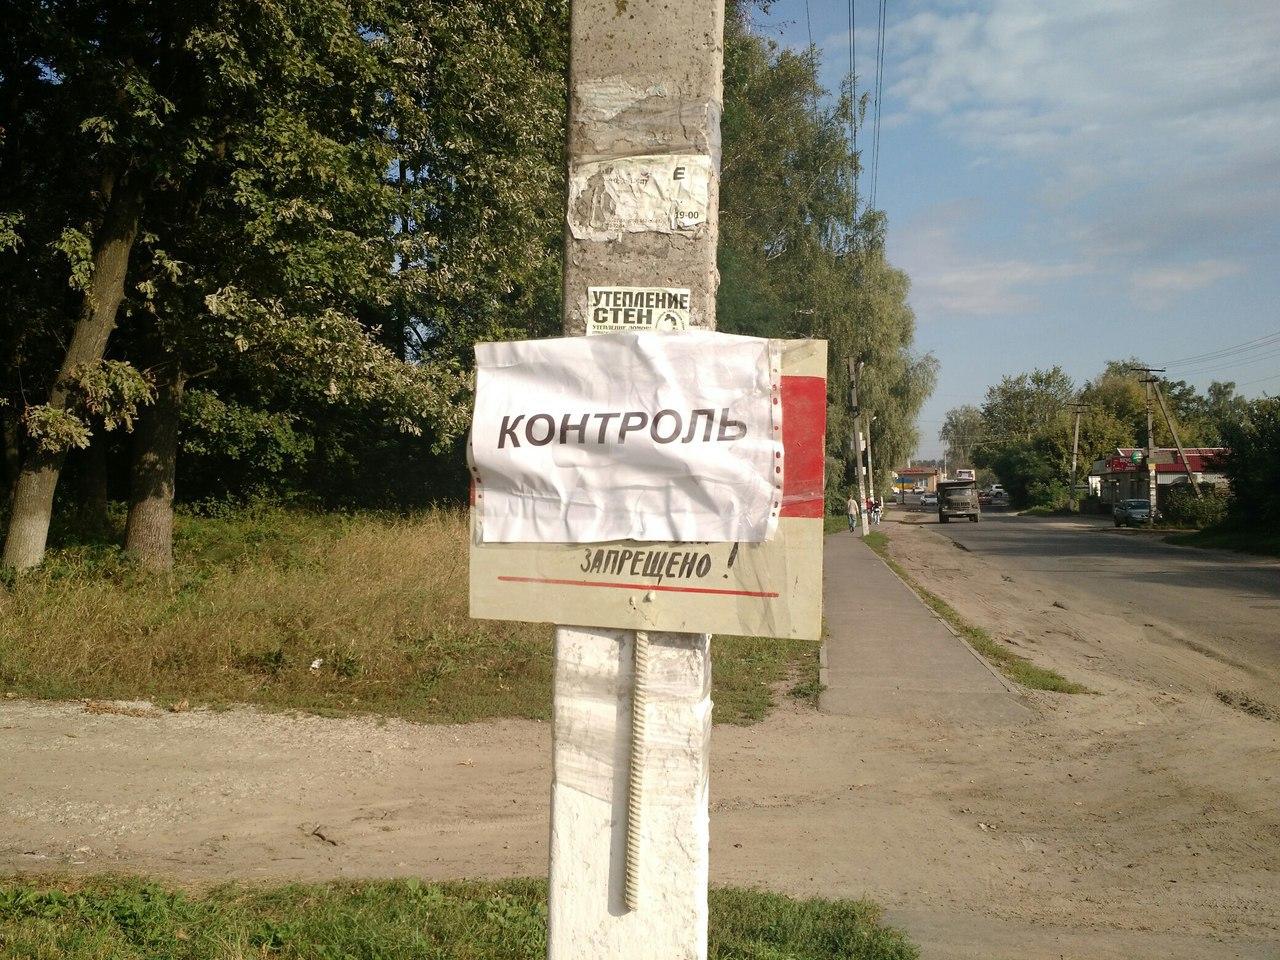 Опасное заболевание дошло до Харькова (ФОТО, ВИДЕО)